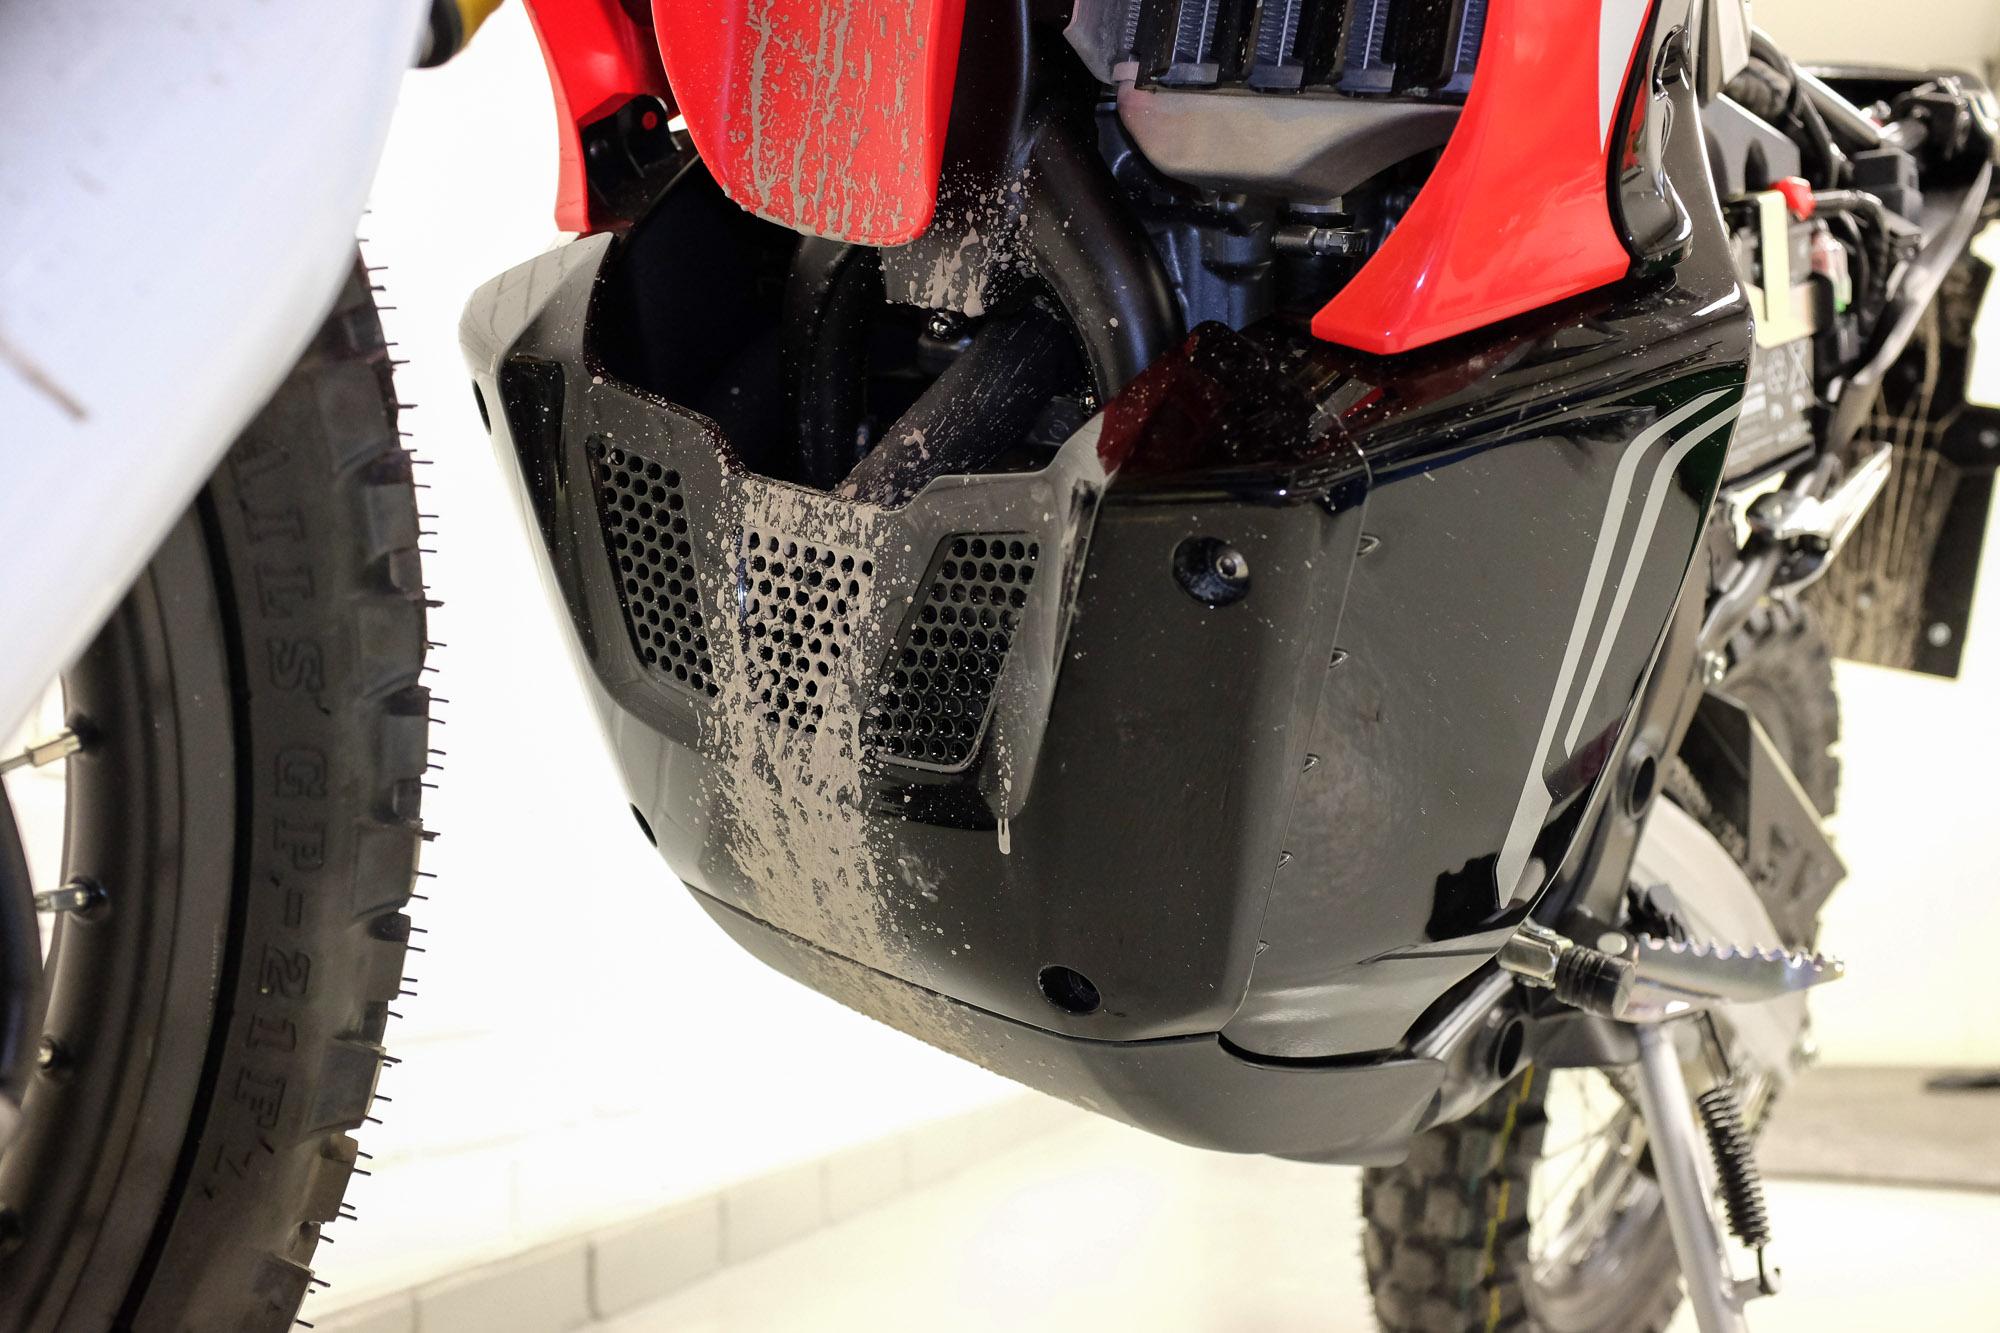 Honda CRF 250 Rally bash plate under closer inspection